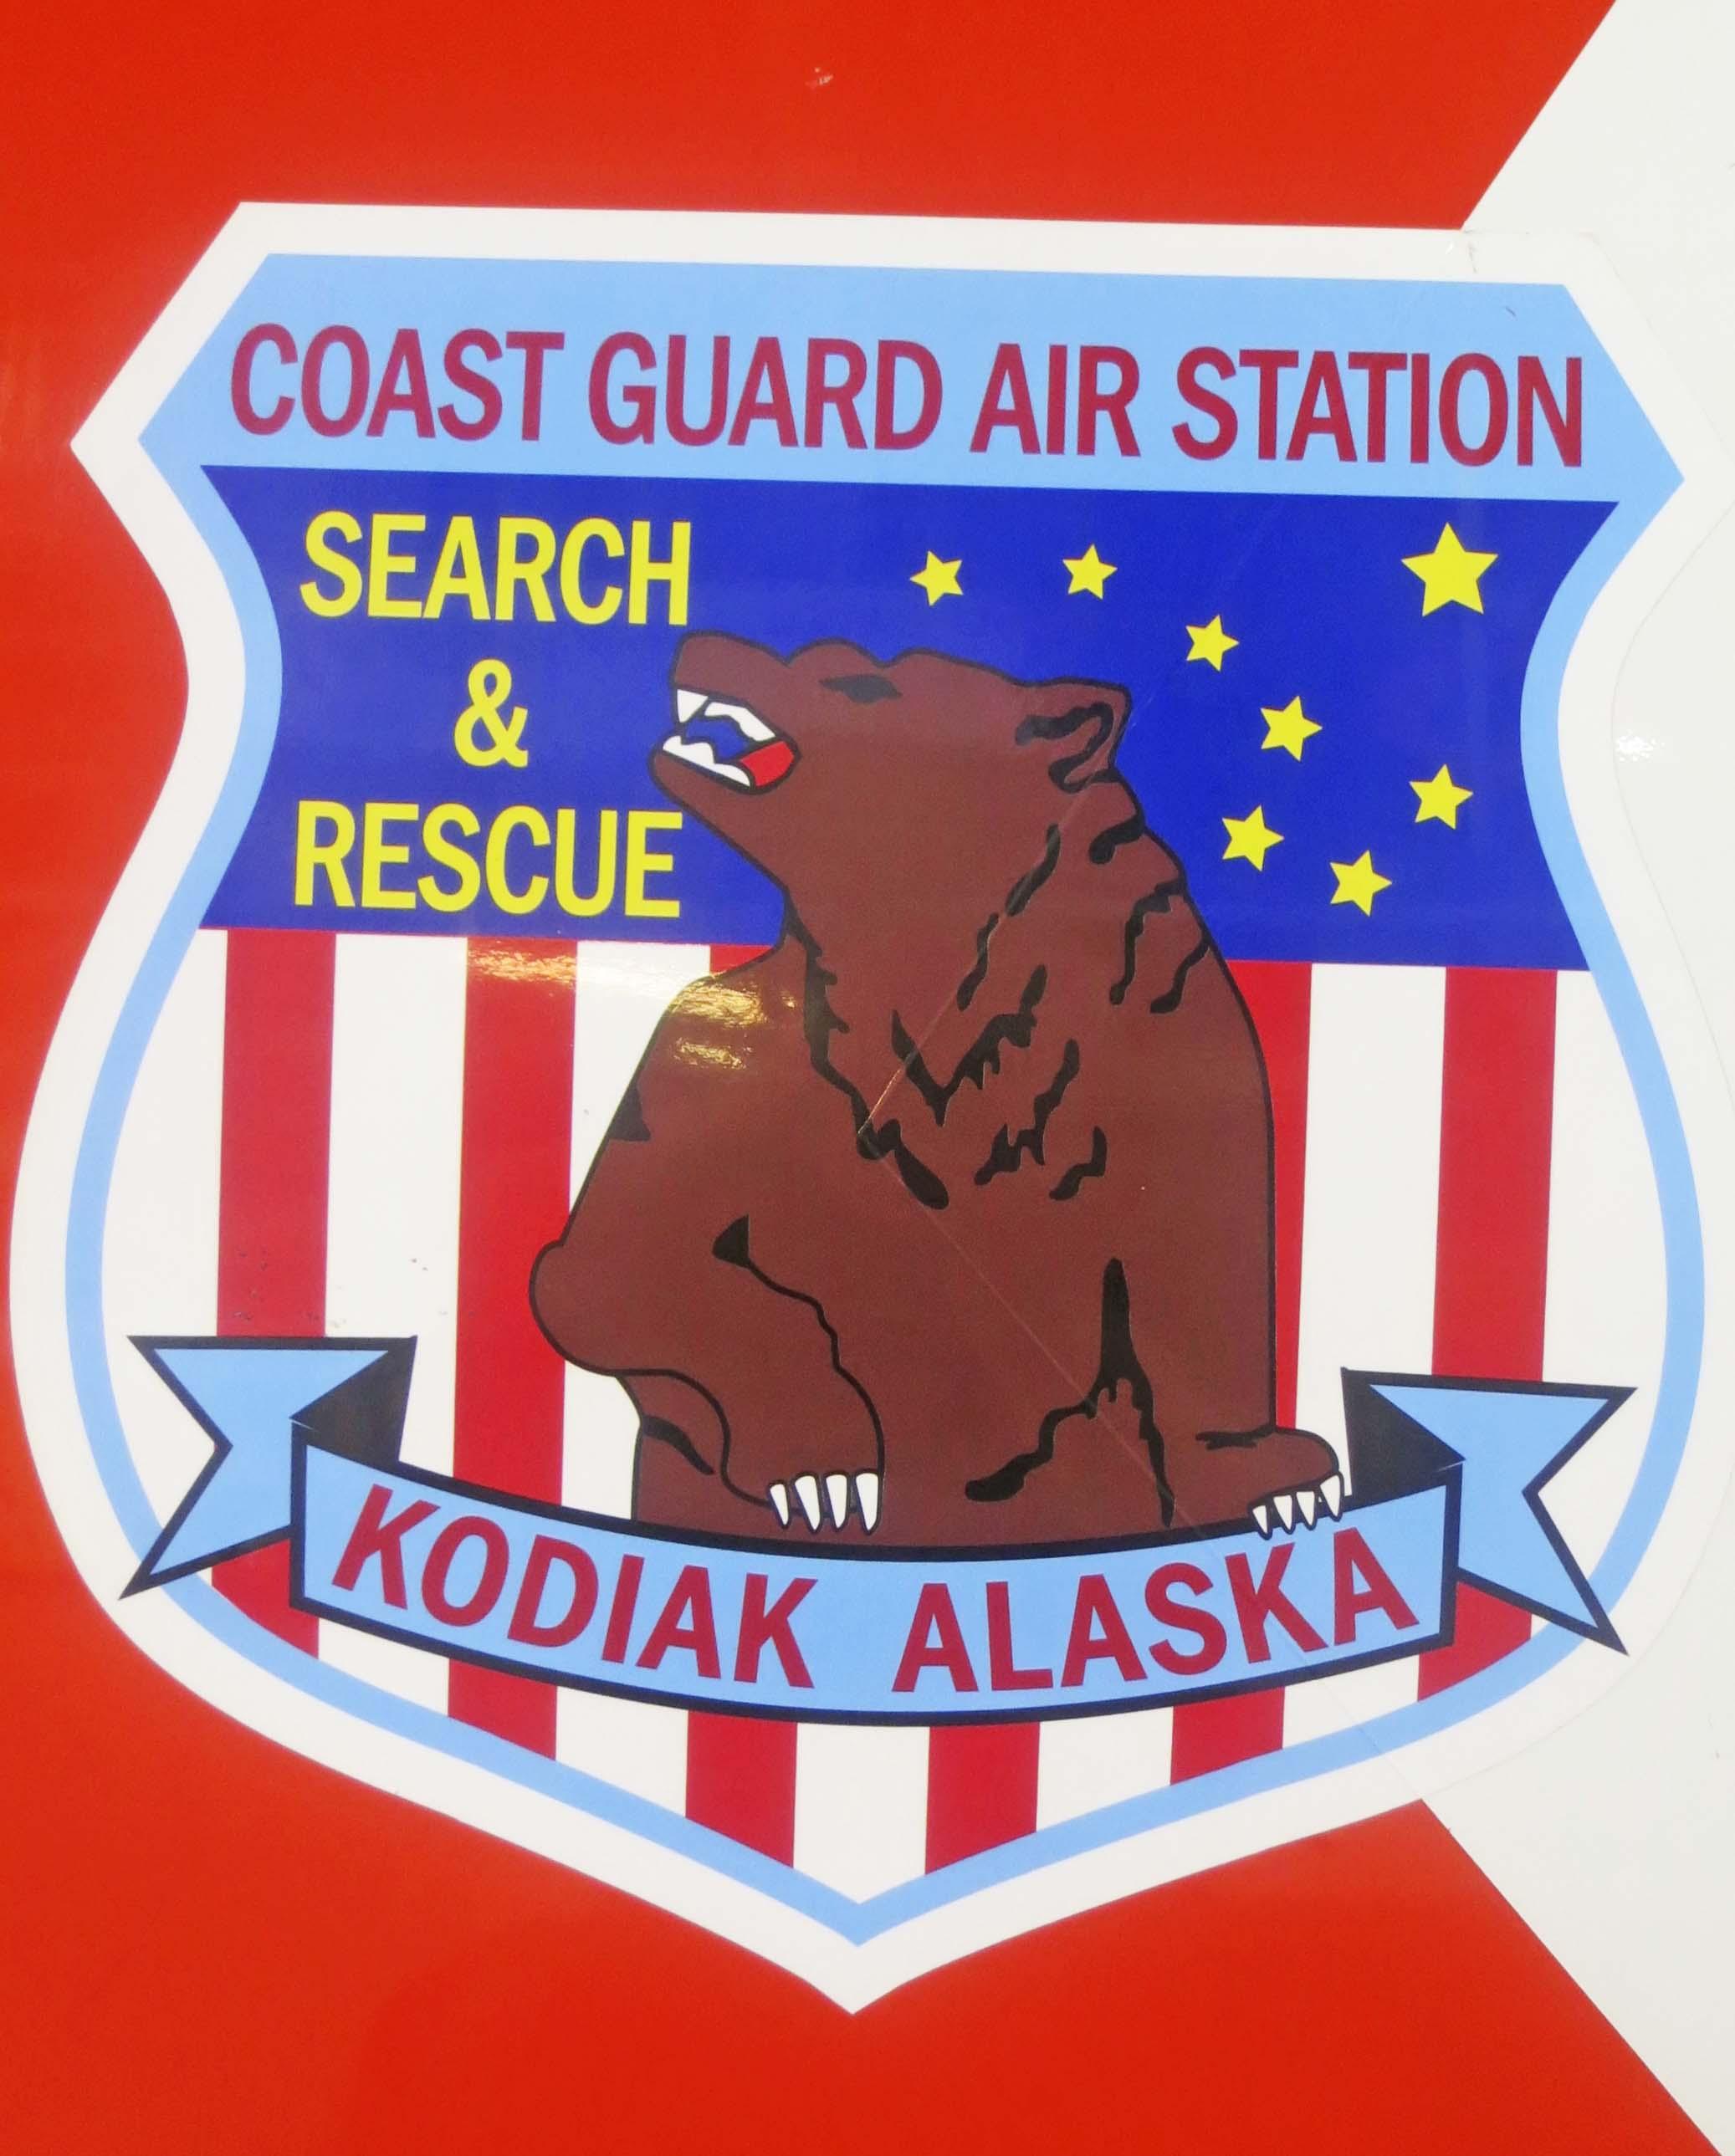 The Coast Guard Air Station on Kodiak rightly features a Kodiak Bear on its logo.